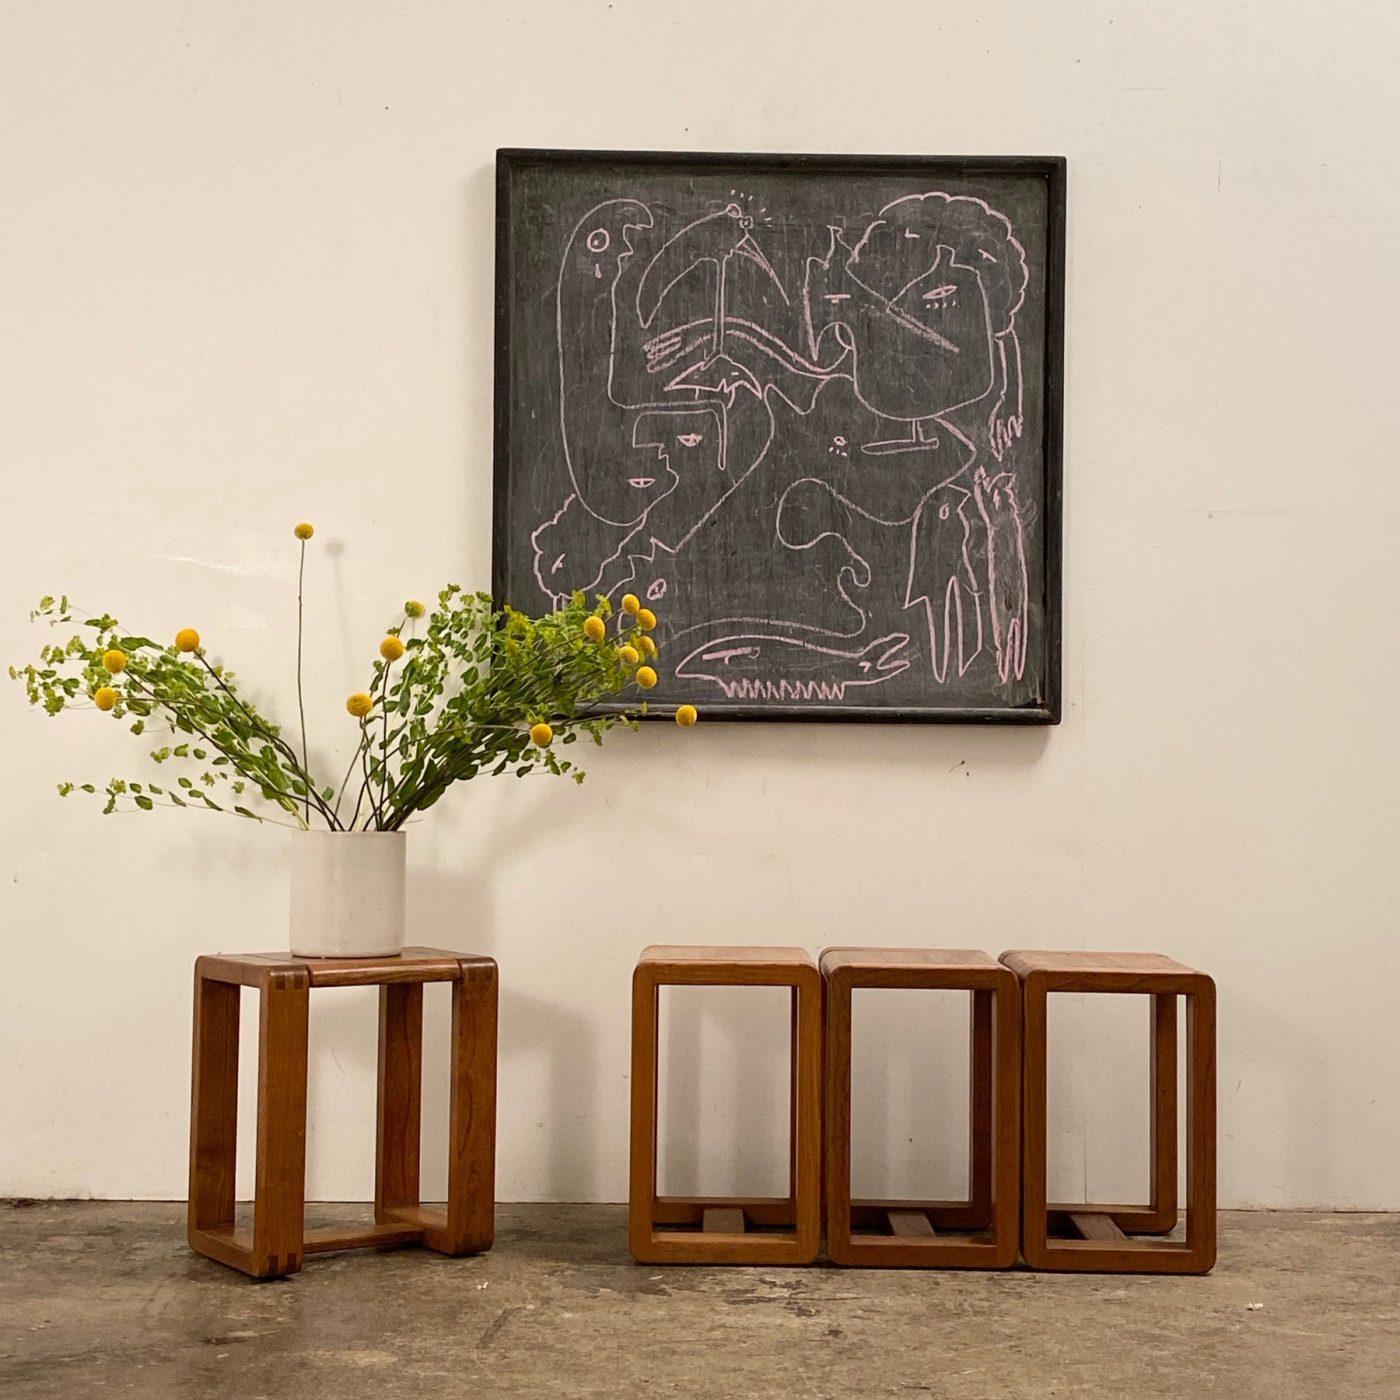 objet-vagabond-massive-stools0002